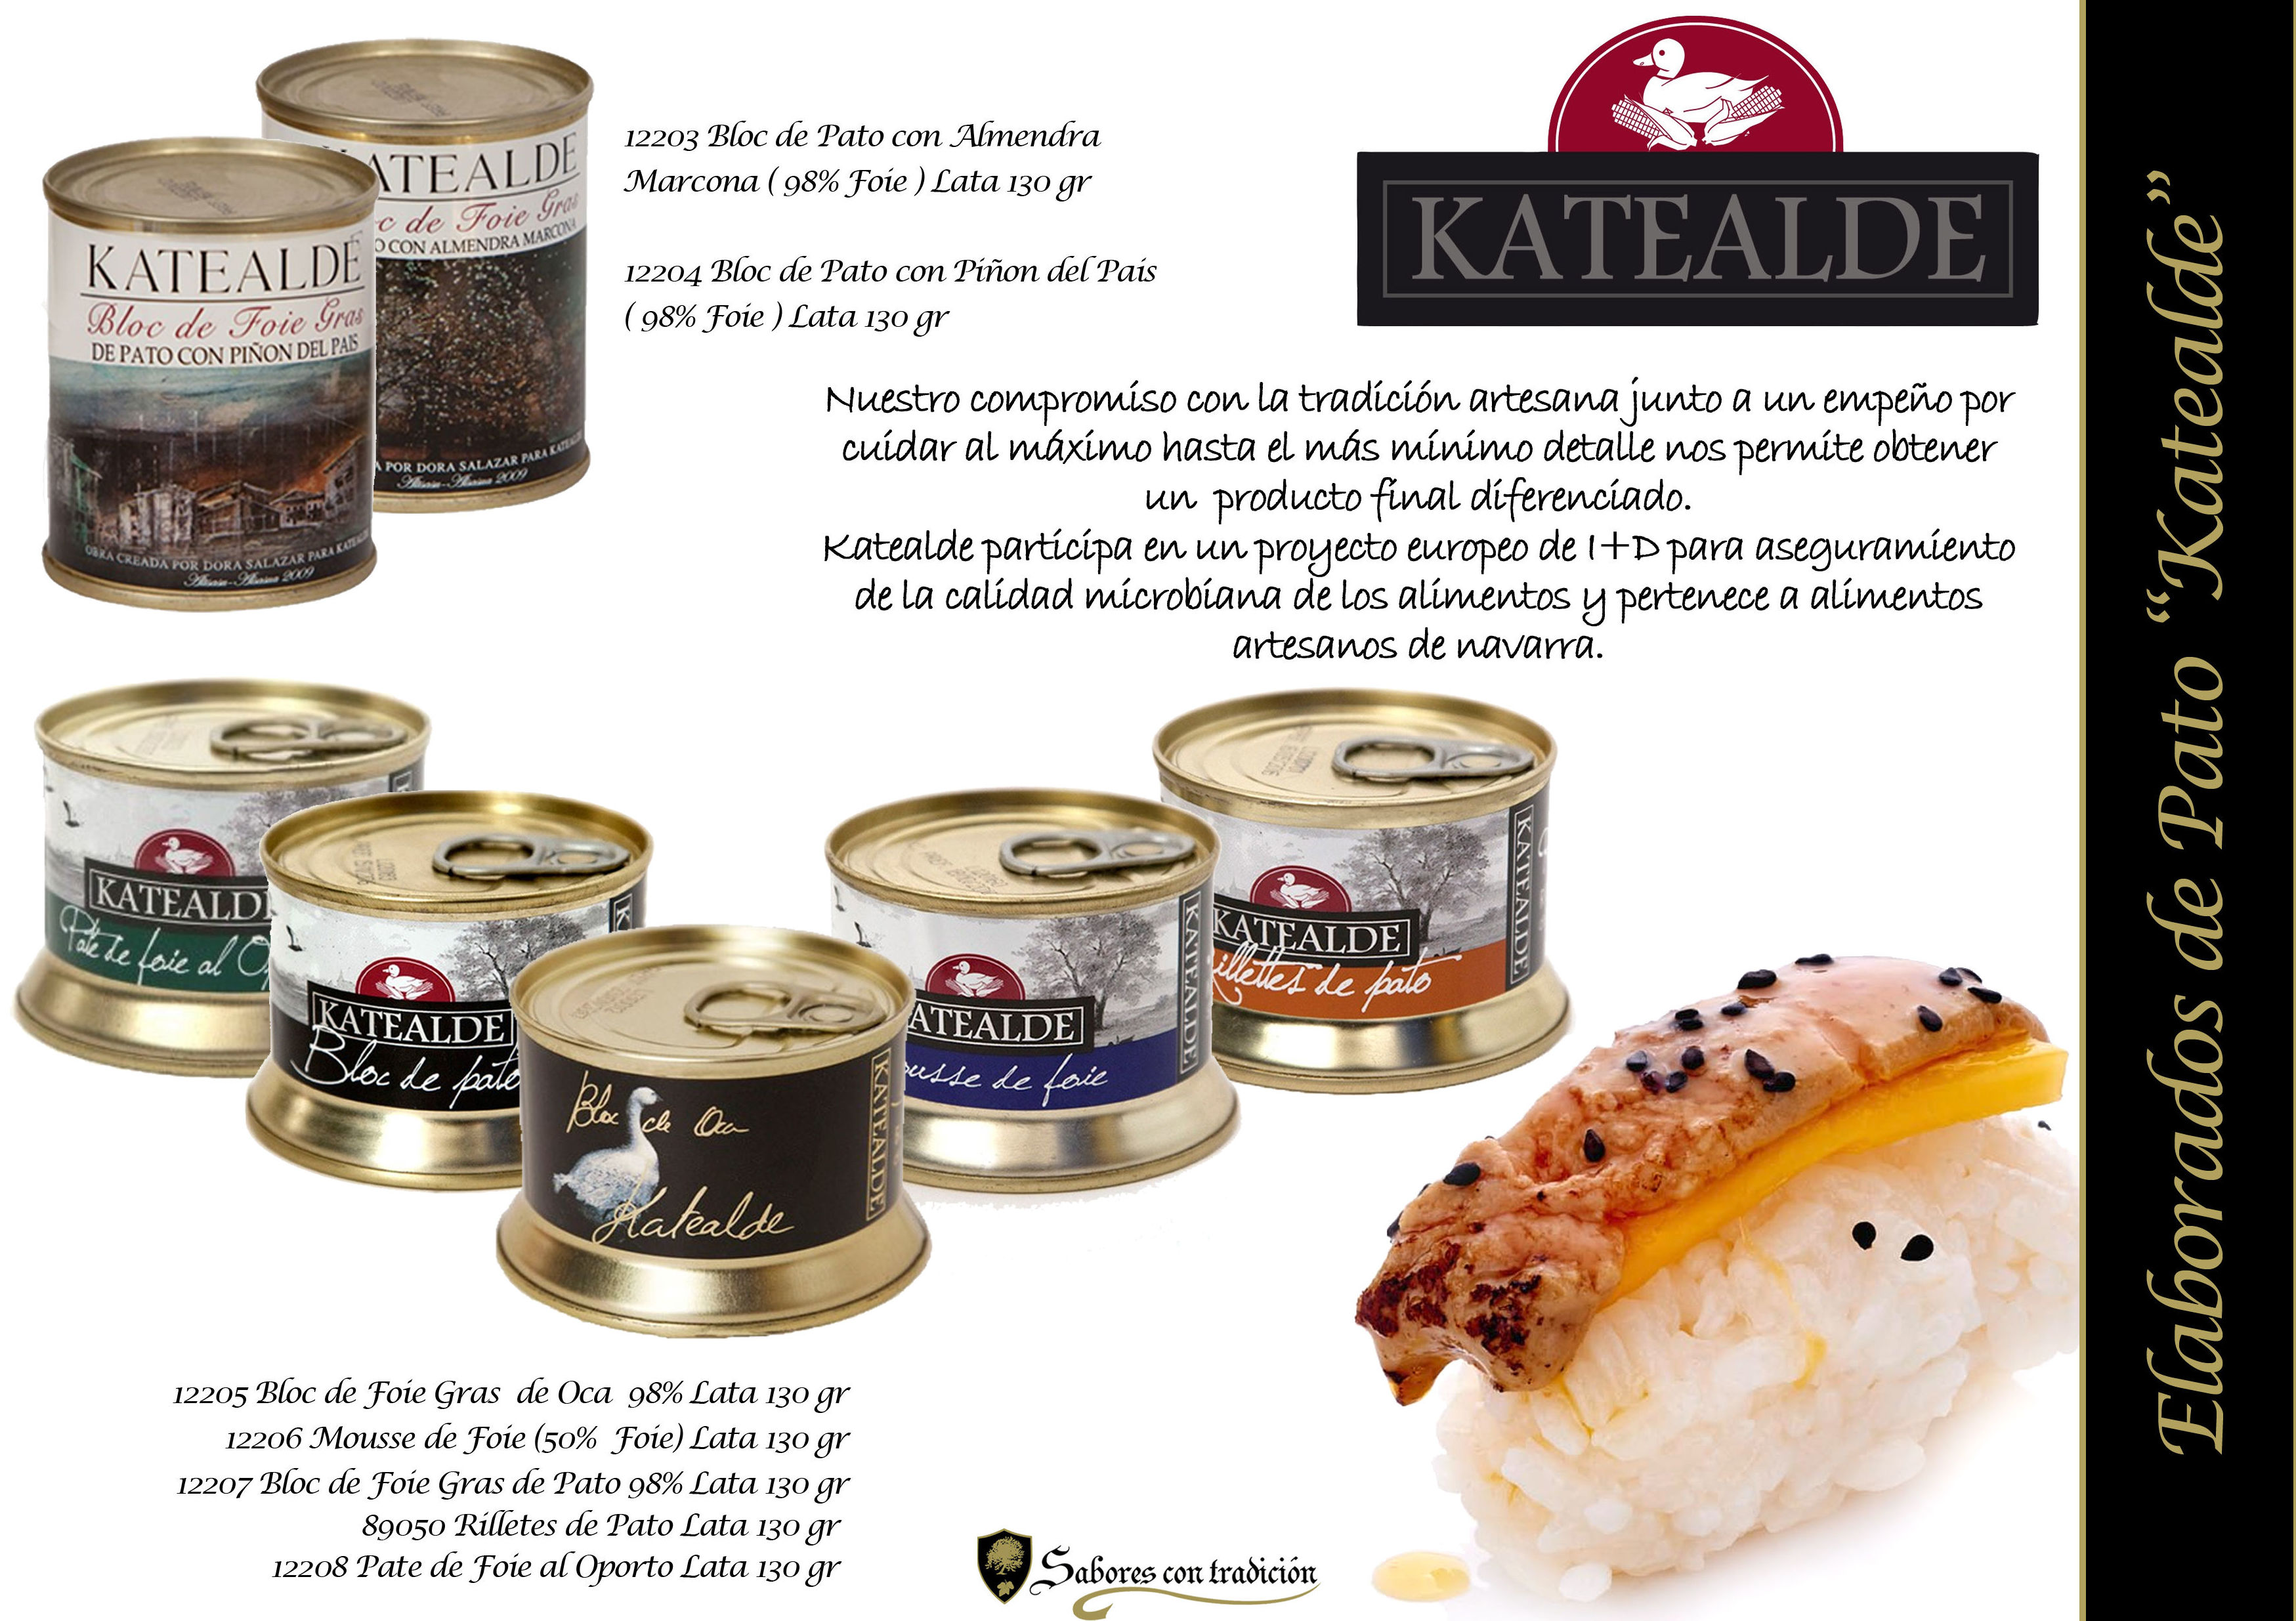 "Pates "" Elaborados Katealde "": Productos de Sabores con tradición"